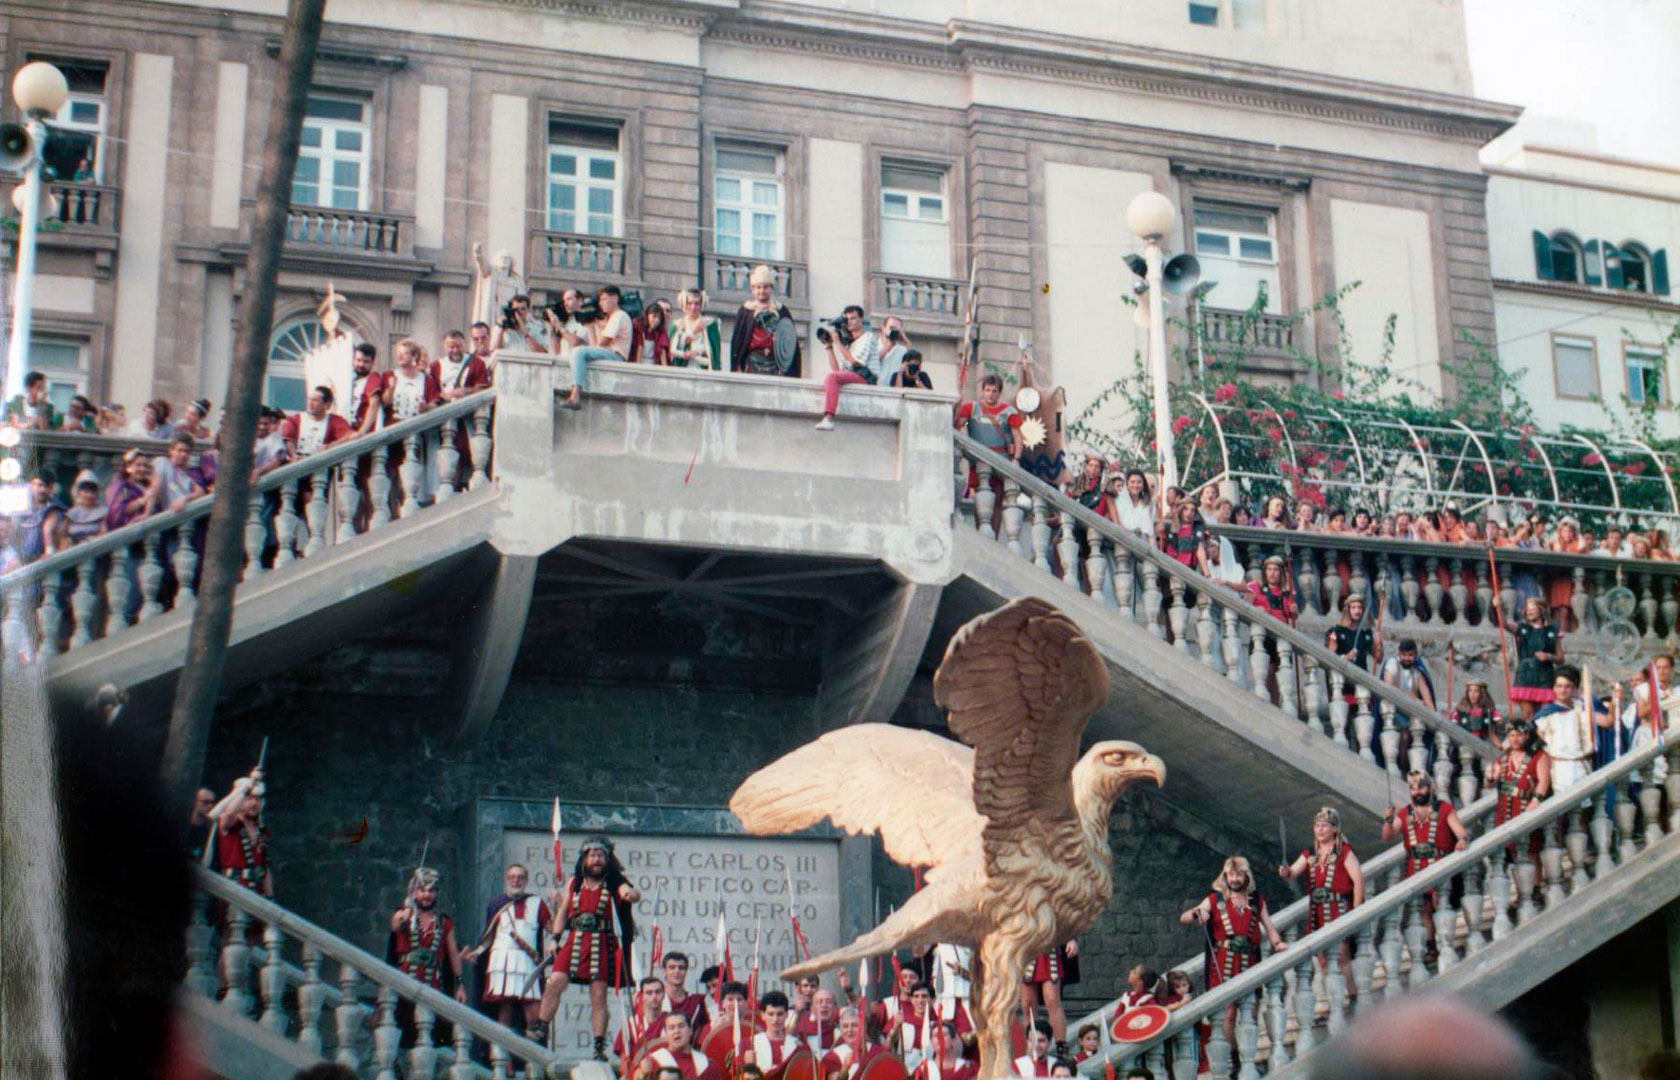 Campamento Año 1990 - Paseo del Muelle Alfonso XII